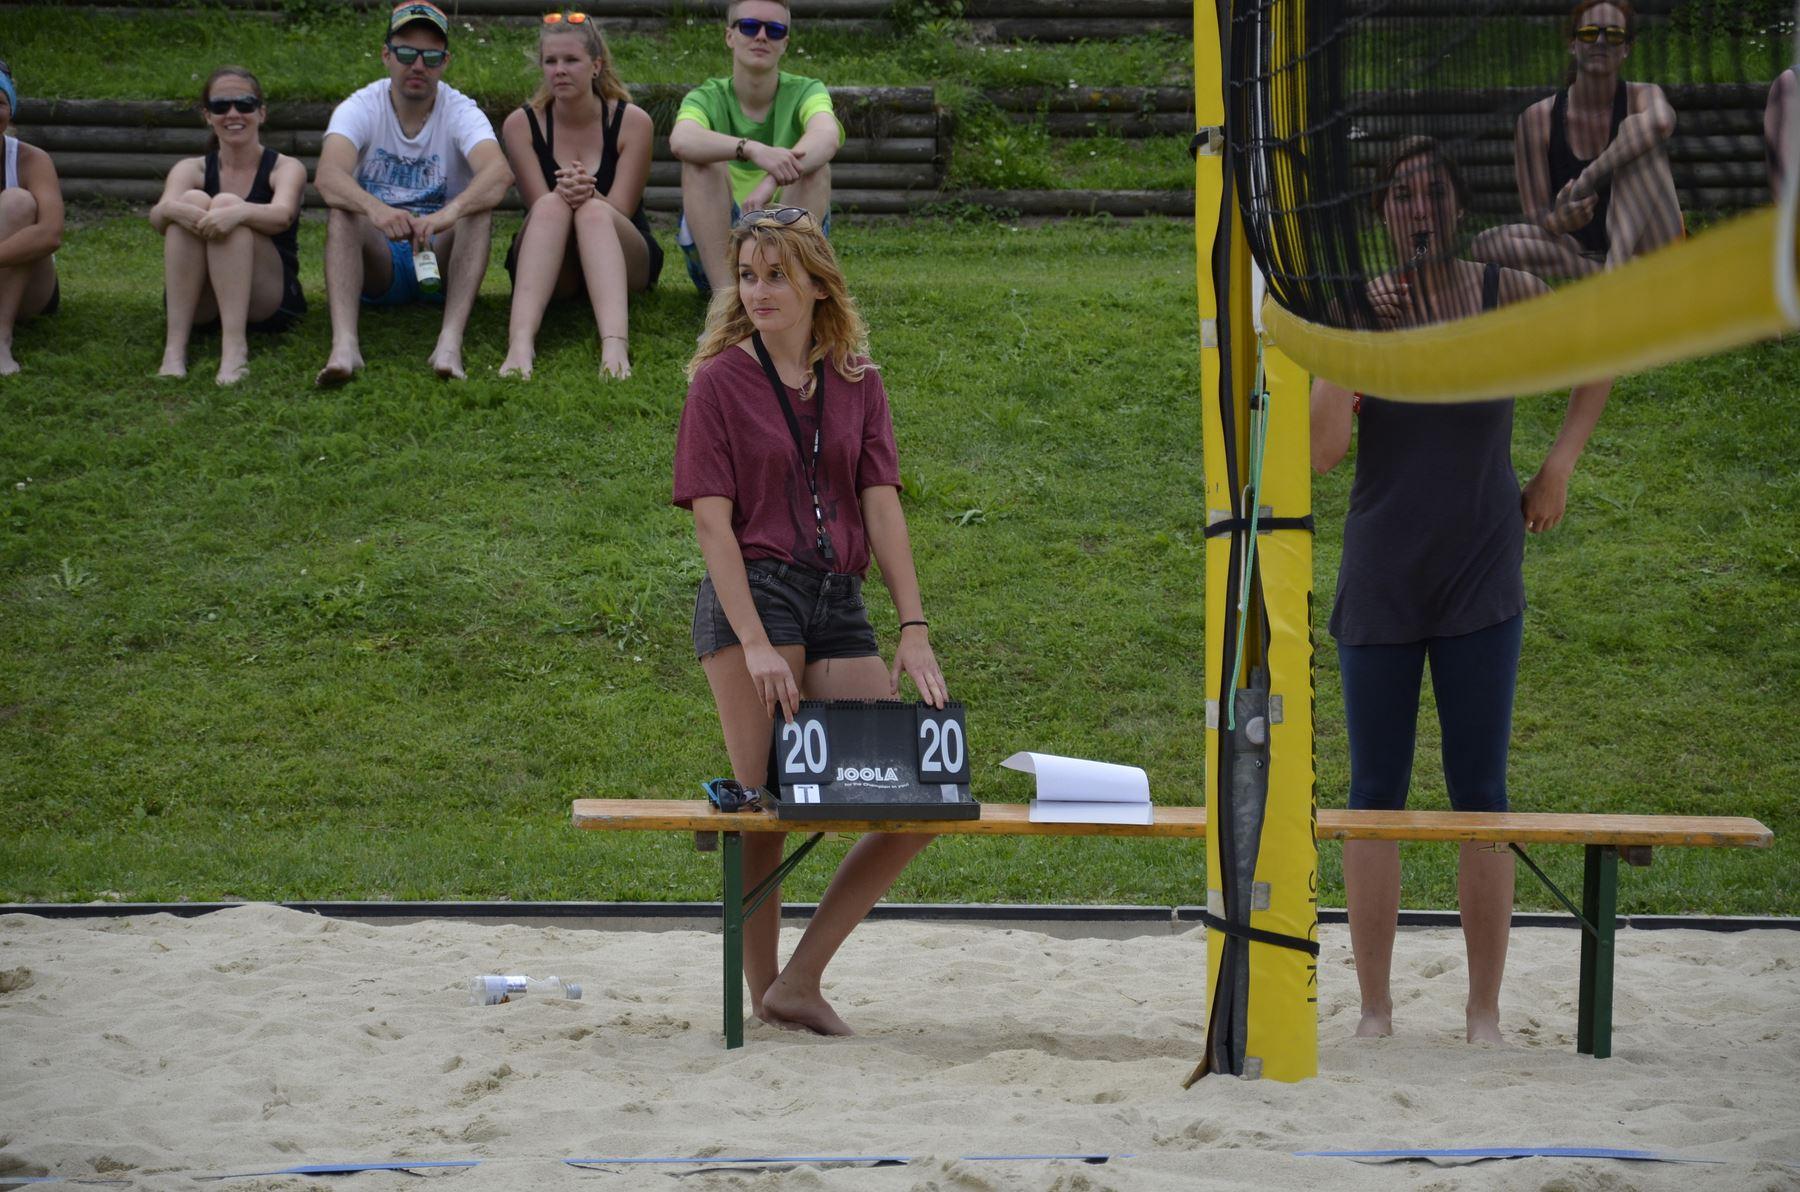 2016-07-02 Beachvolleyball 243